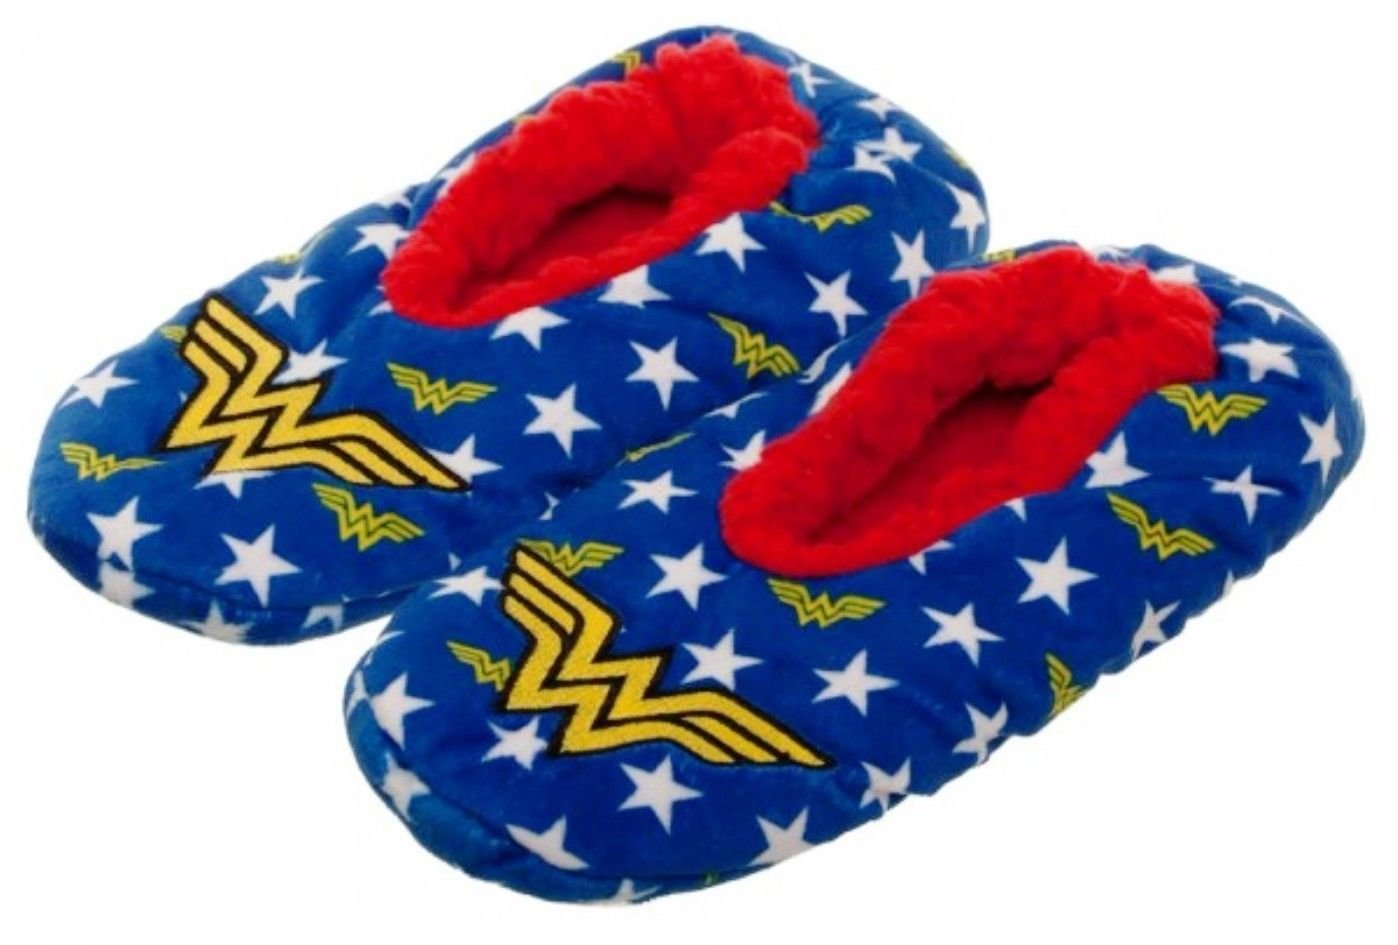 New Horizons Production DC Comics Wonder Woman Stars and Logo Plush Cozy Unisex Adult Slippers (Small/Medium)